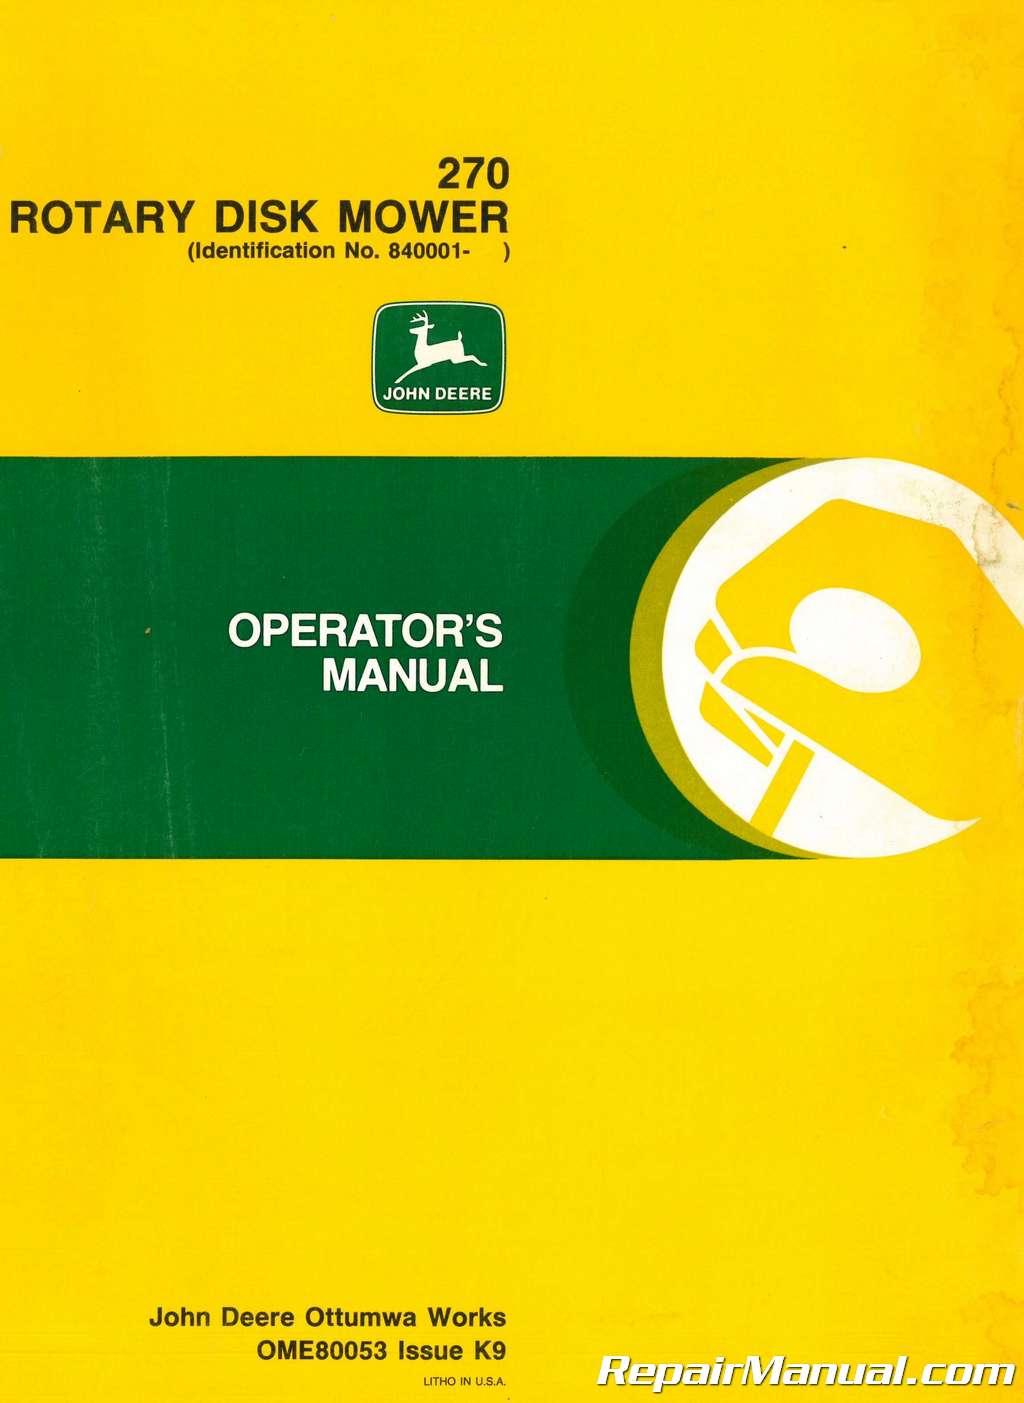 Used John Deere Rotary Disk Mower Operators Manual